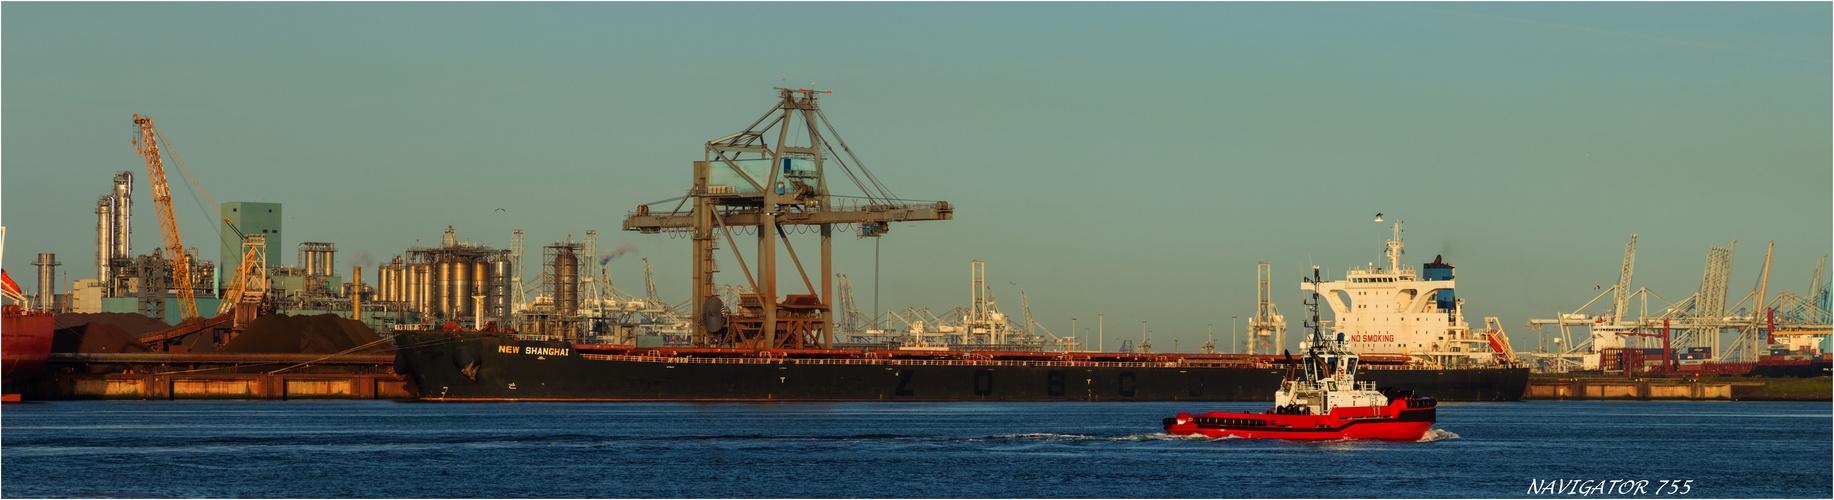 NEW SHANGHAI, Bulk Carrier, Rotterdam.